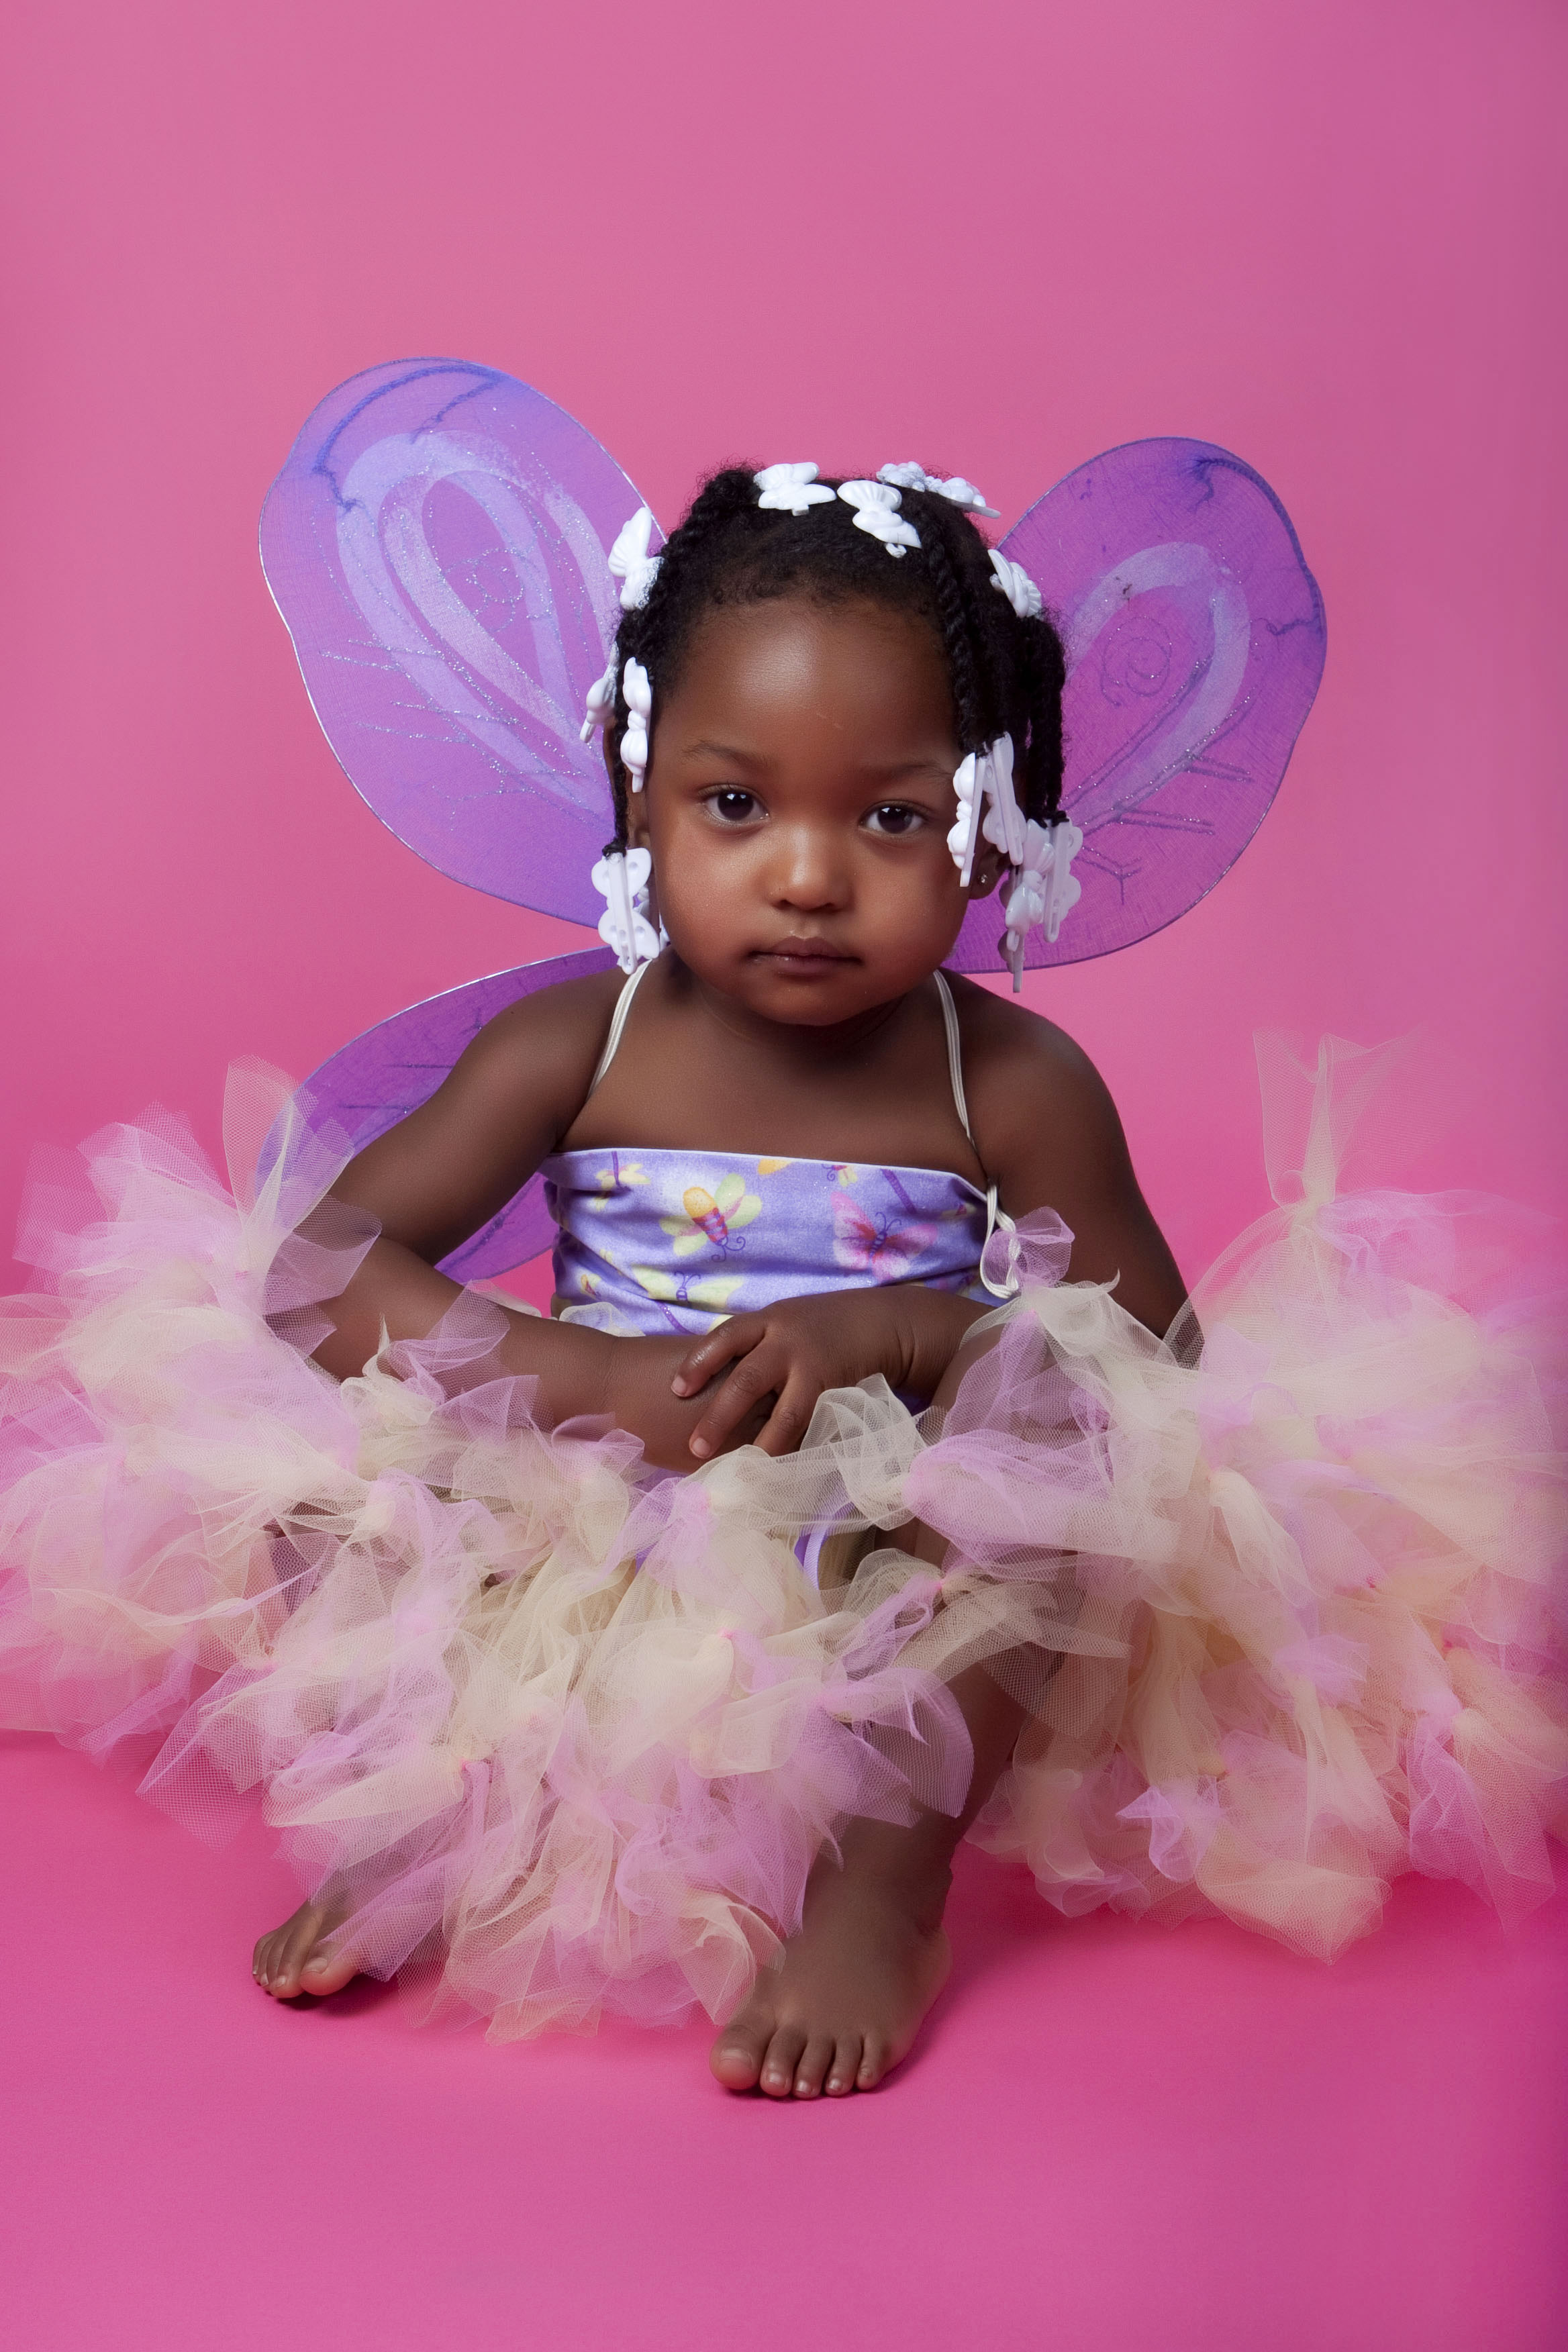 babytoddlergirlportraitstudiophotographyokemoslansingmichigan.jpg